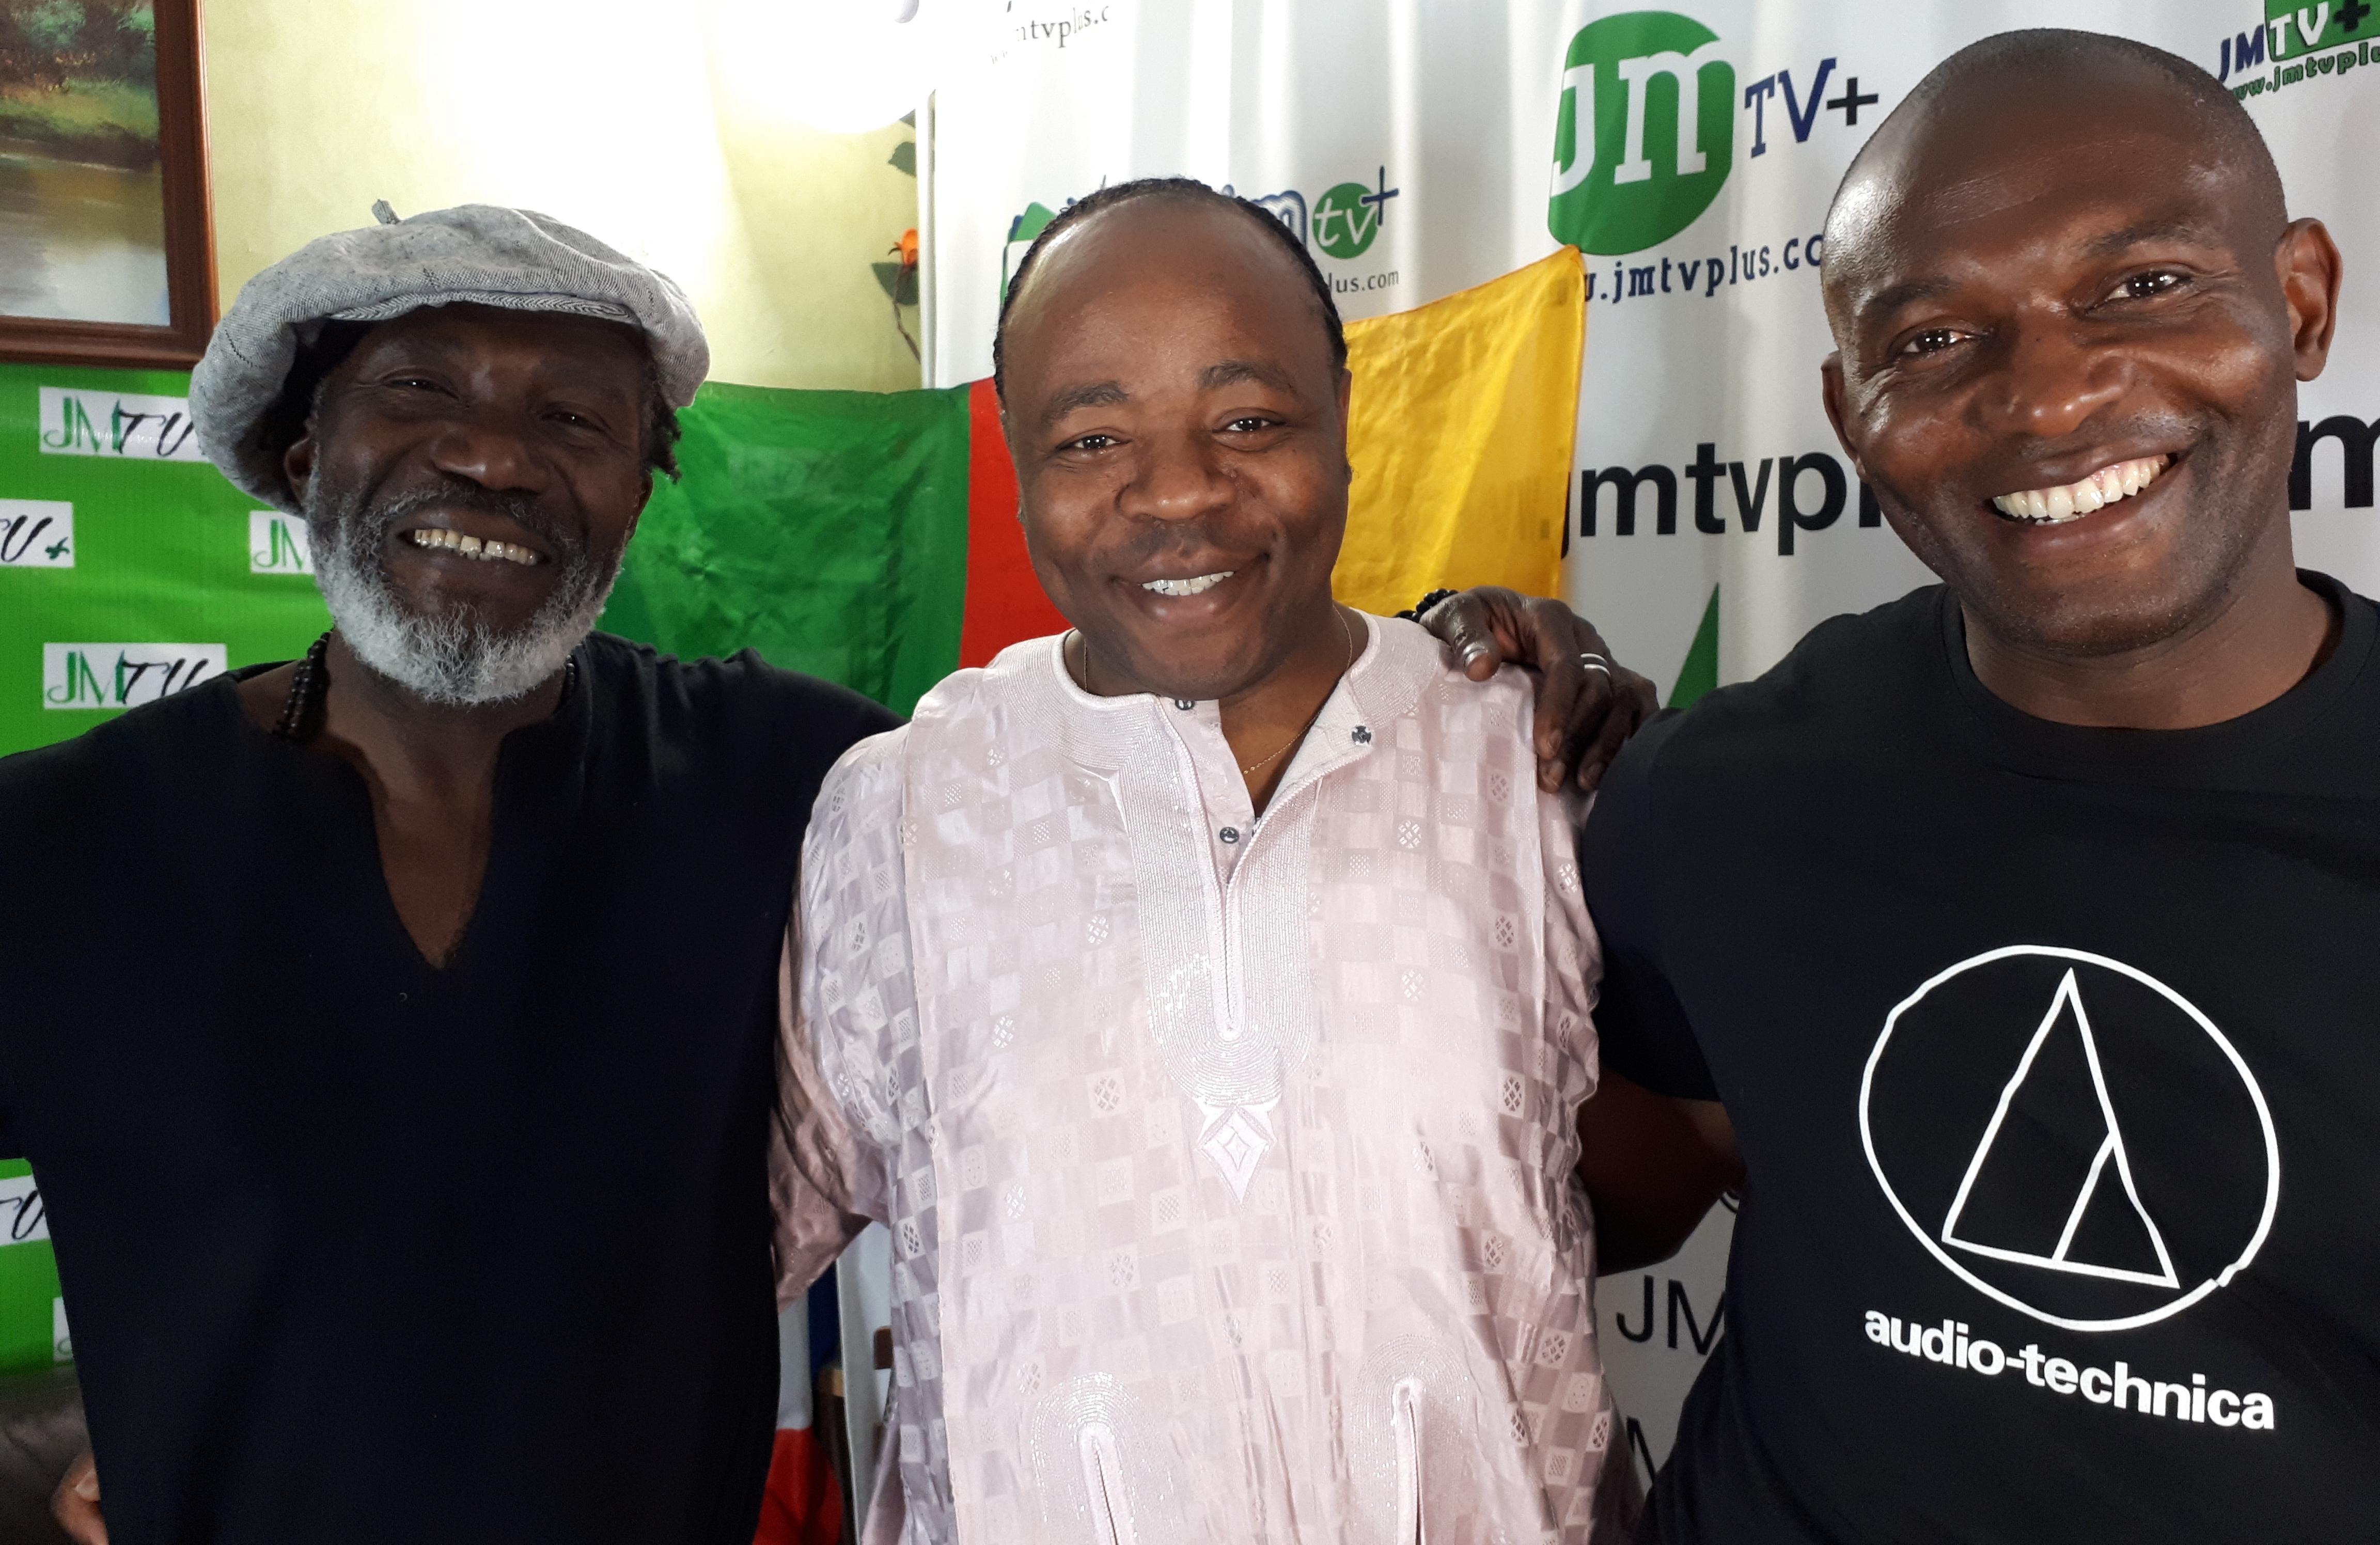 SANGO NDEDI NDOLO dans le «BŒUF-BOURGUIGNON de JACKY MOIFFO» Vol 1(JMTV+)